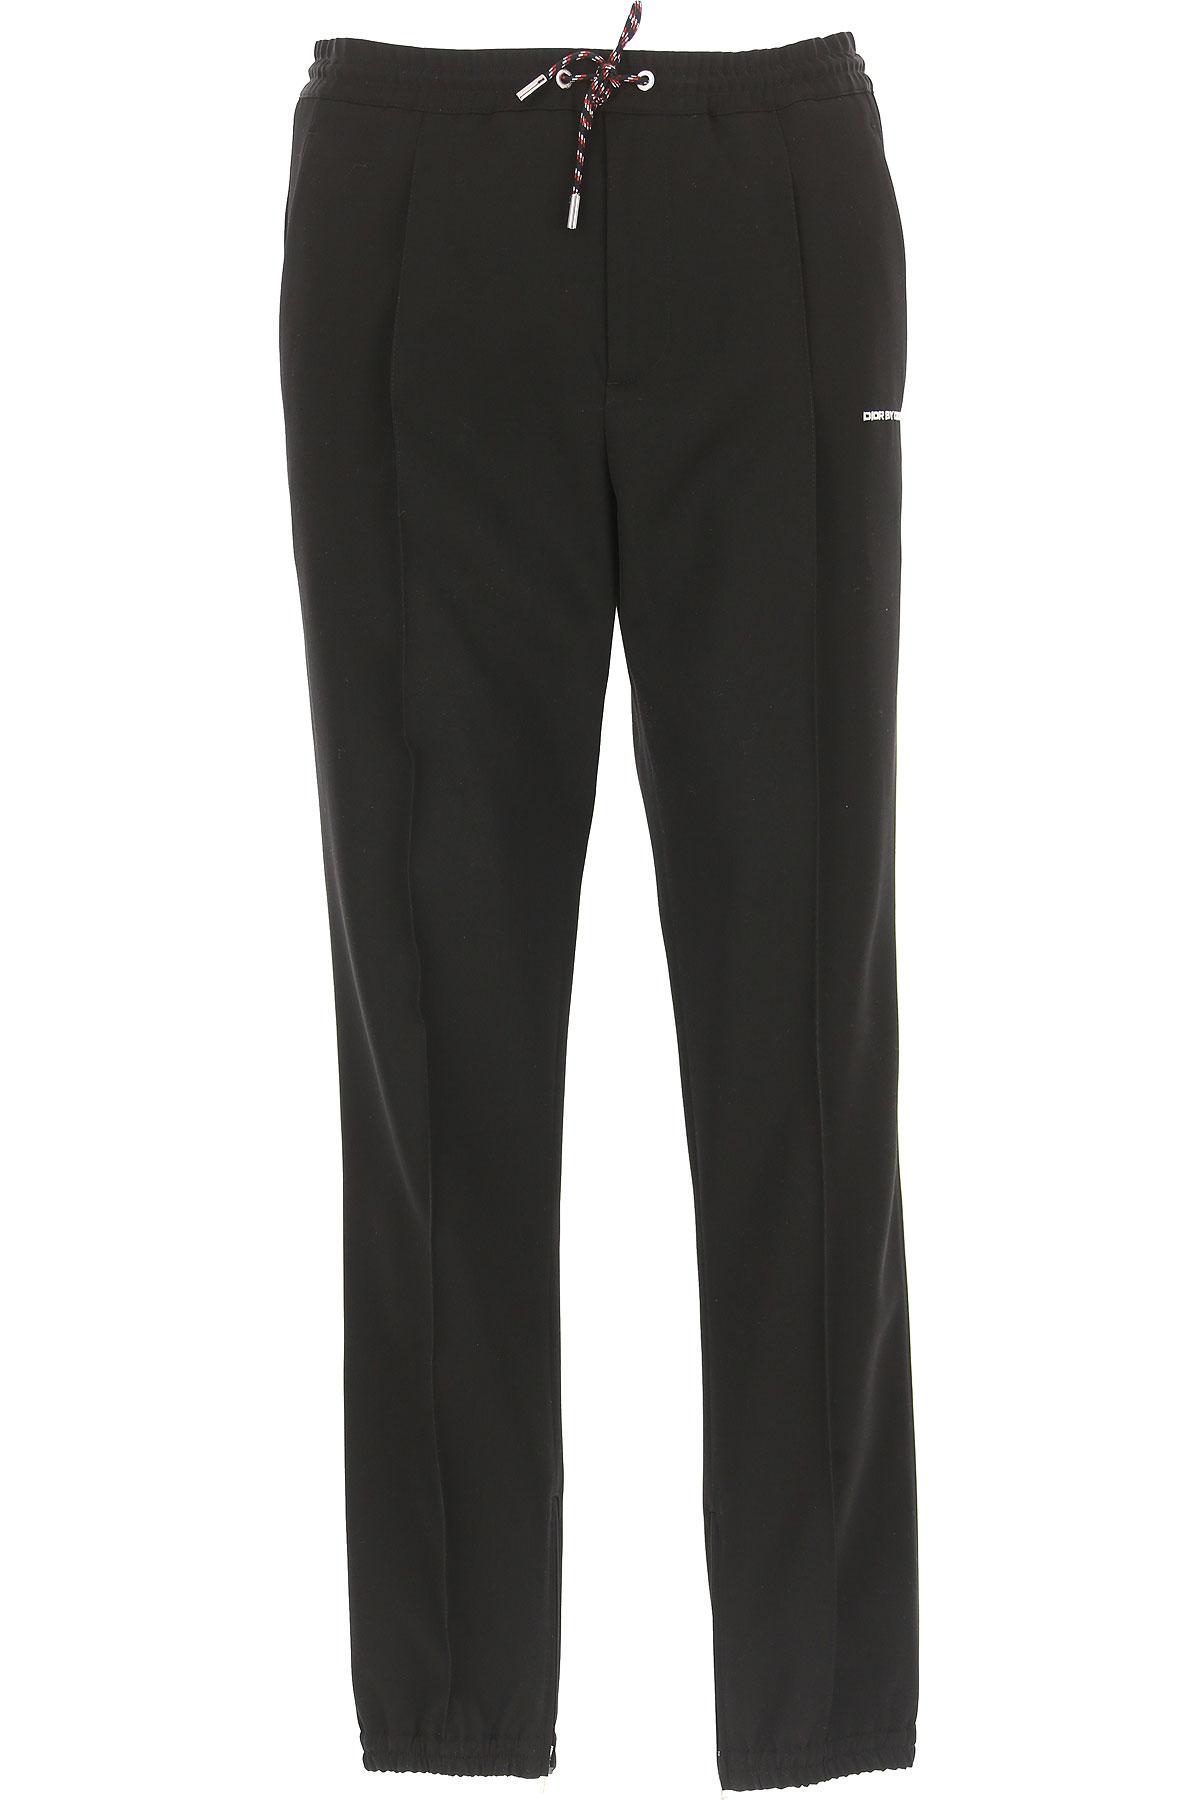 Christian Dior Pants for Men On Sale in Outlet, Black, Virgin wool, 2019, 30 34